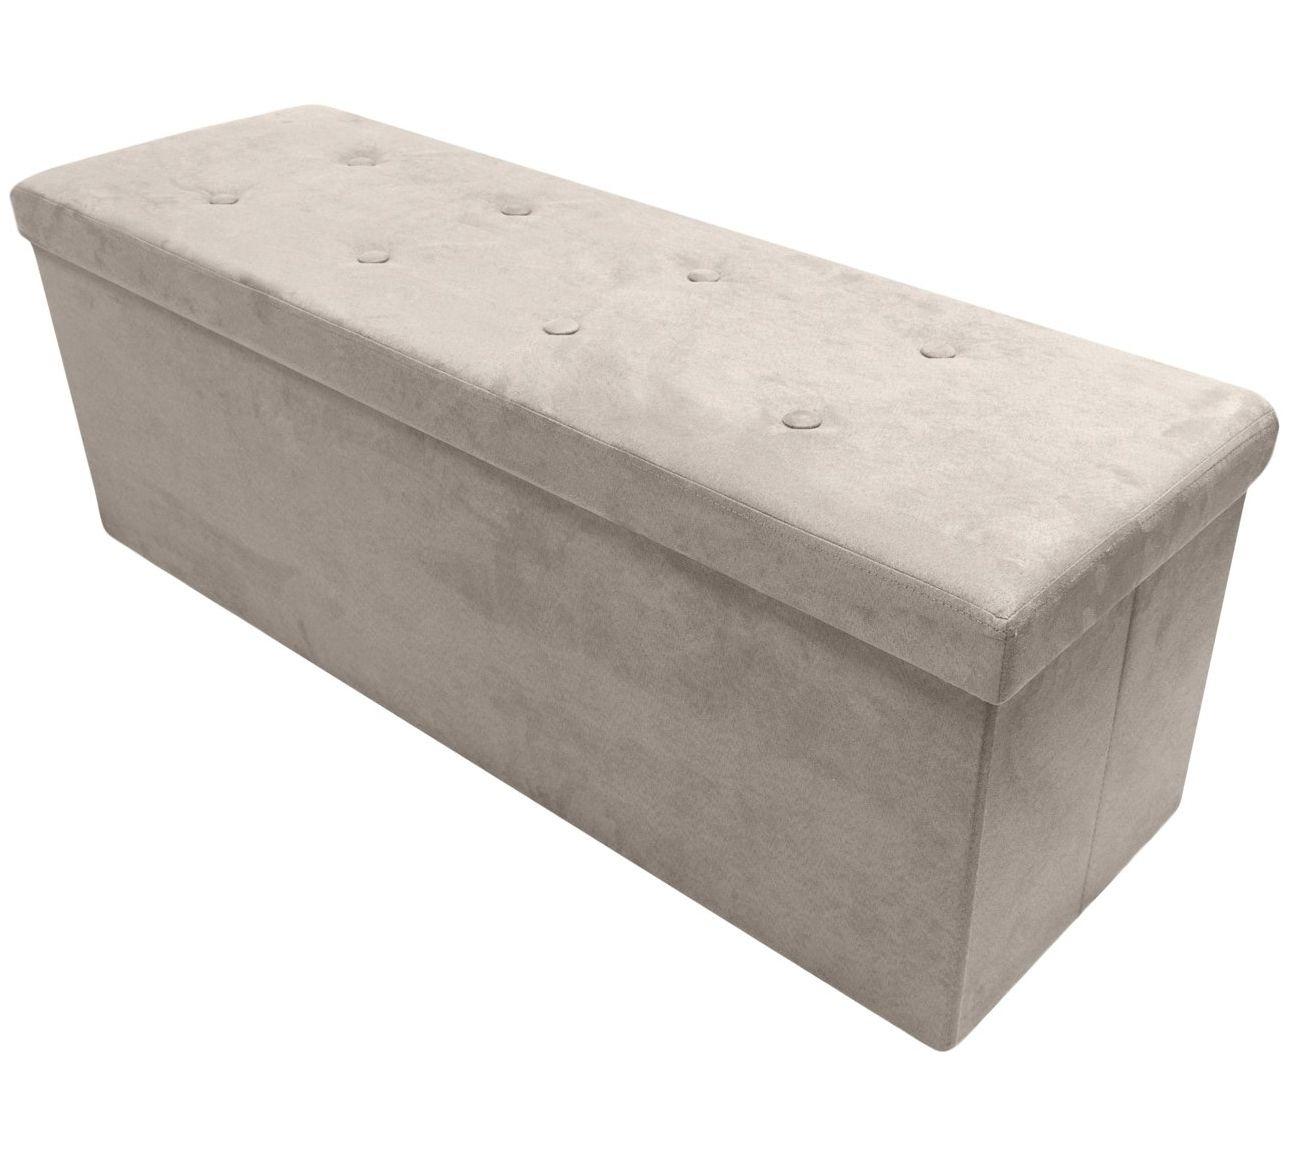 Sorbus Storage Bench Chest Ottoman W Cover Faux Suede Large Qvc Com